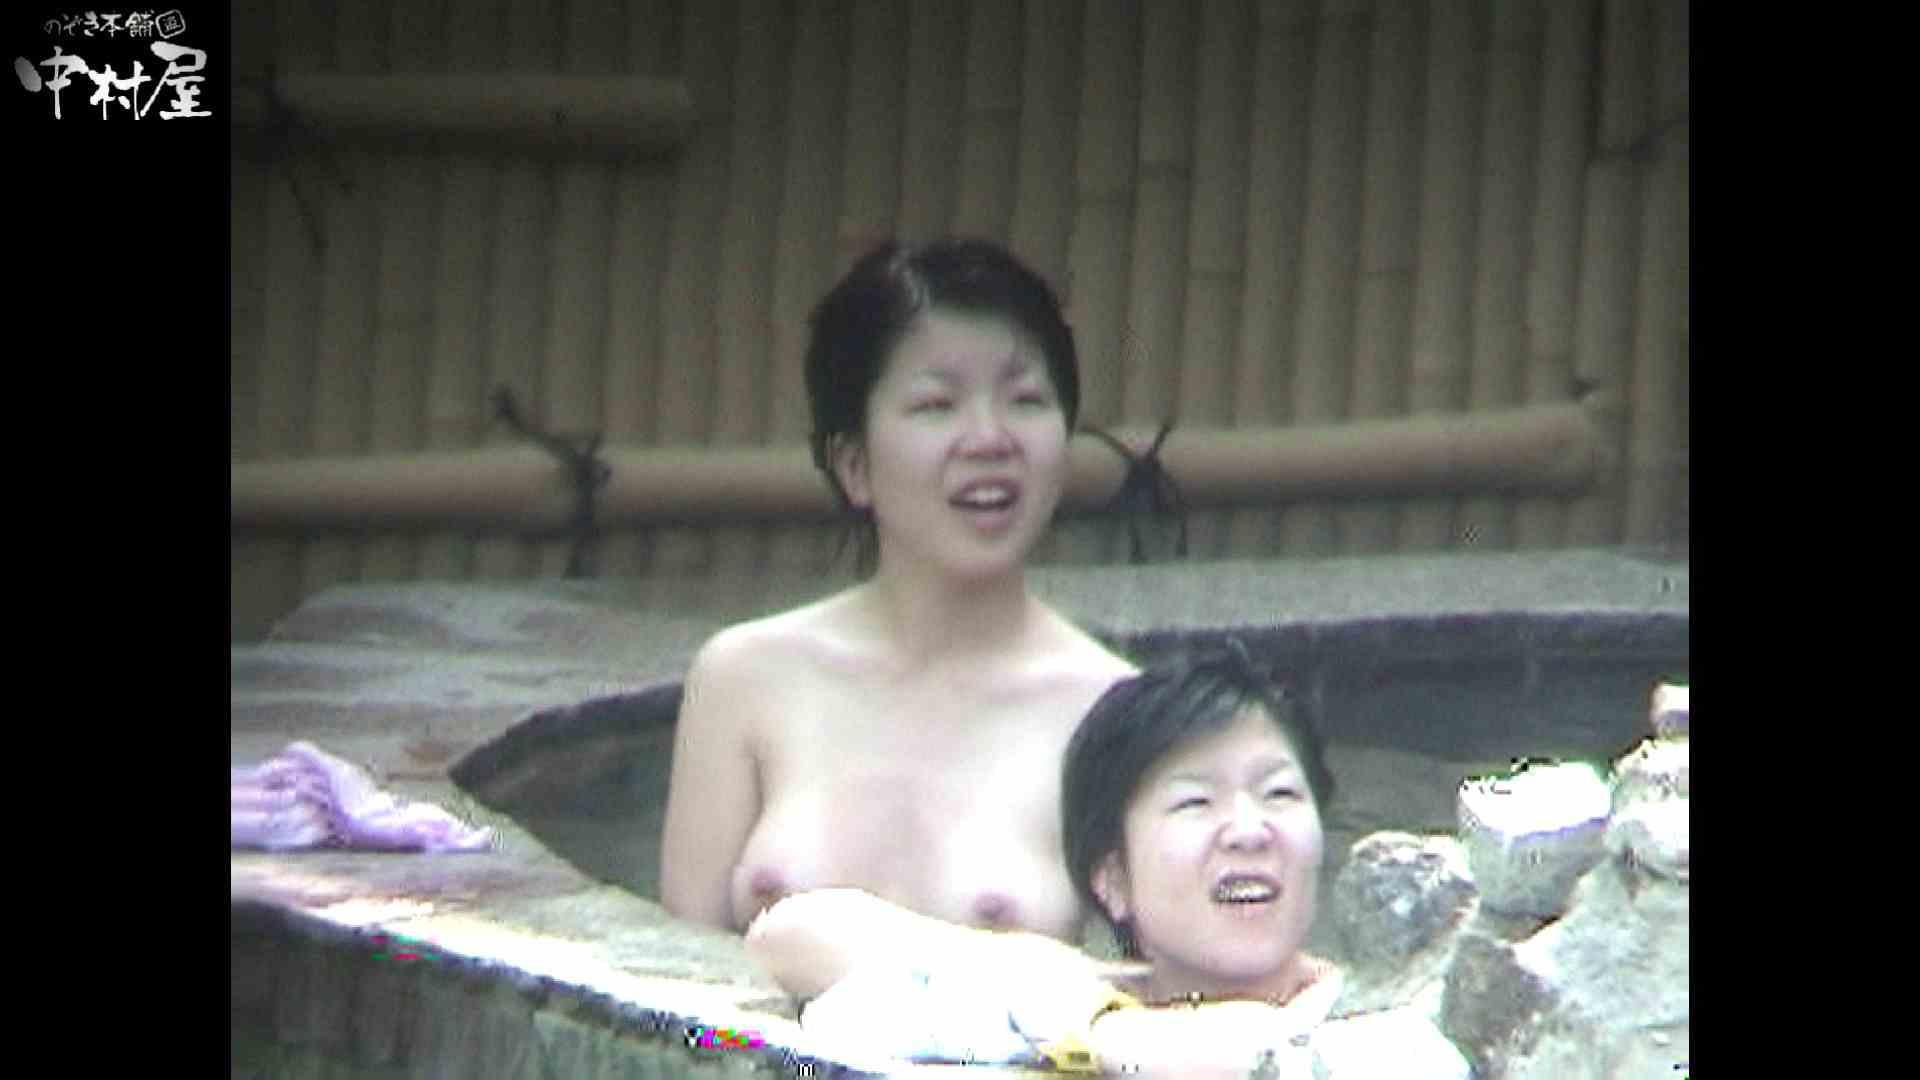 Aquaな露天風呂Vol.936 盗撮 AV無料 78枚 5